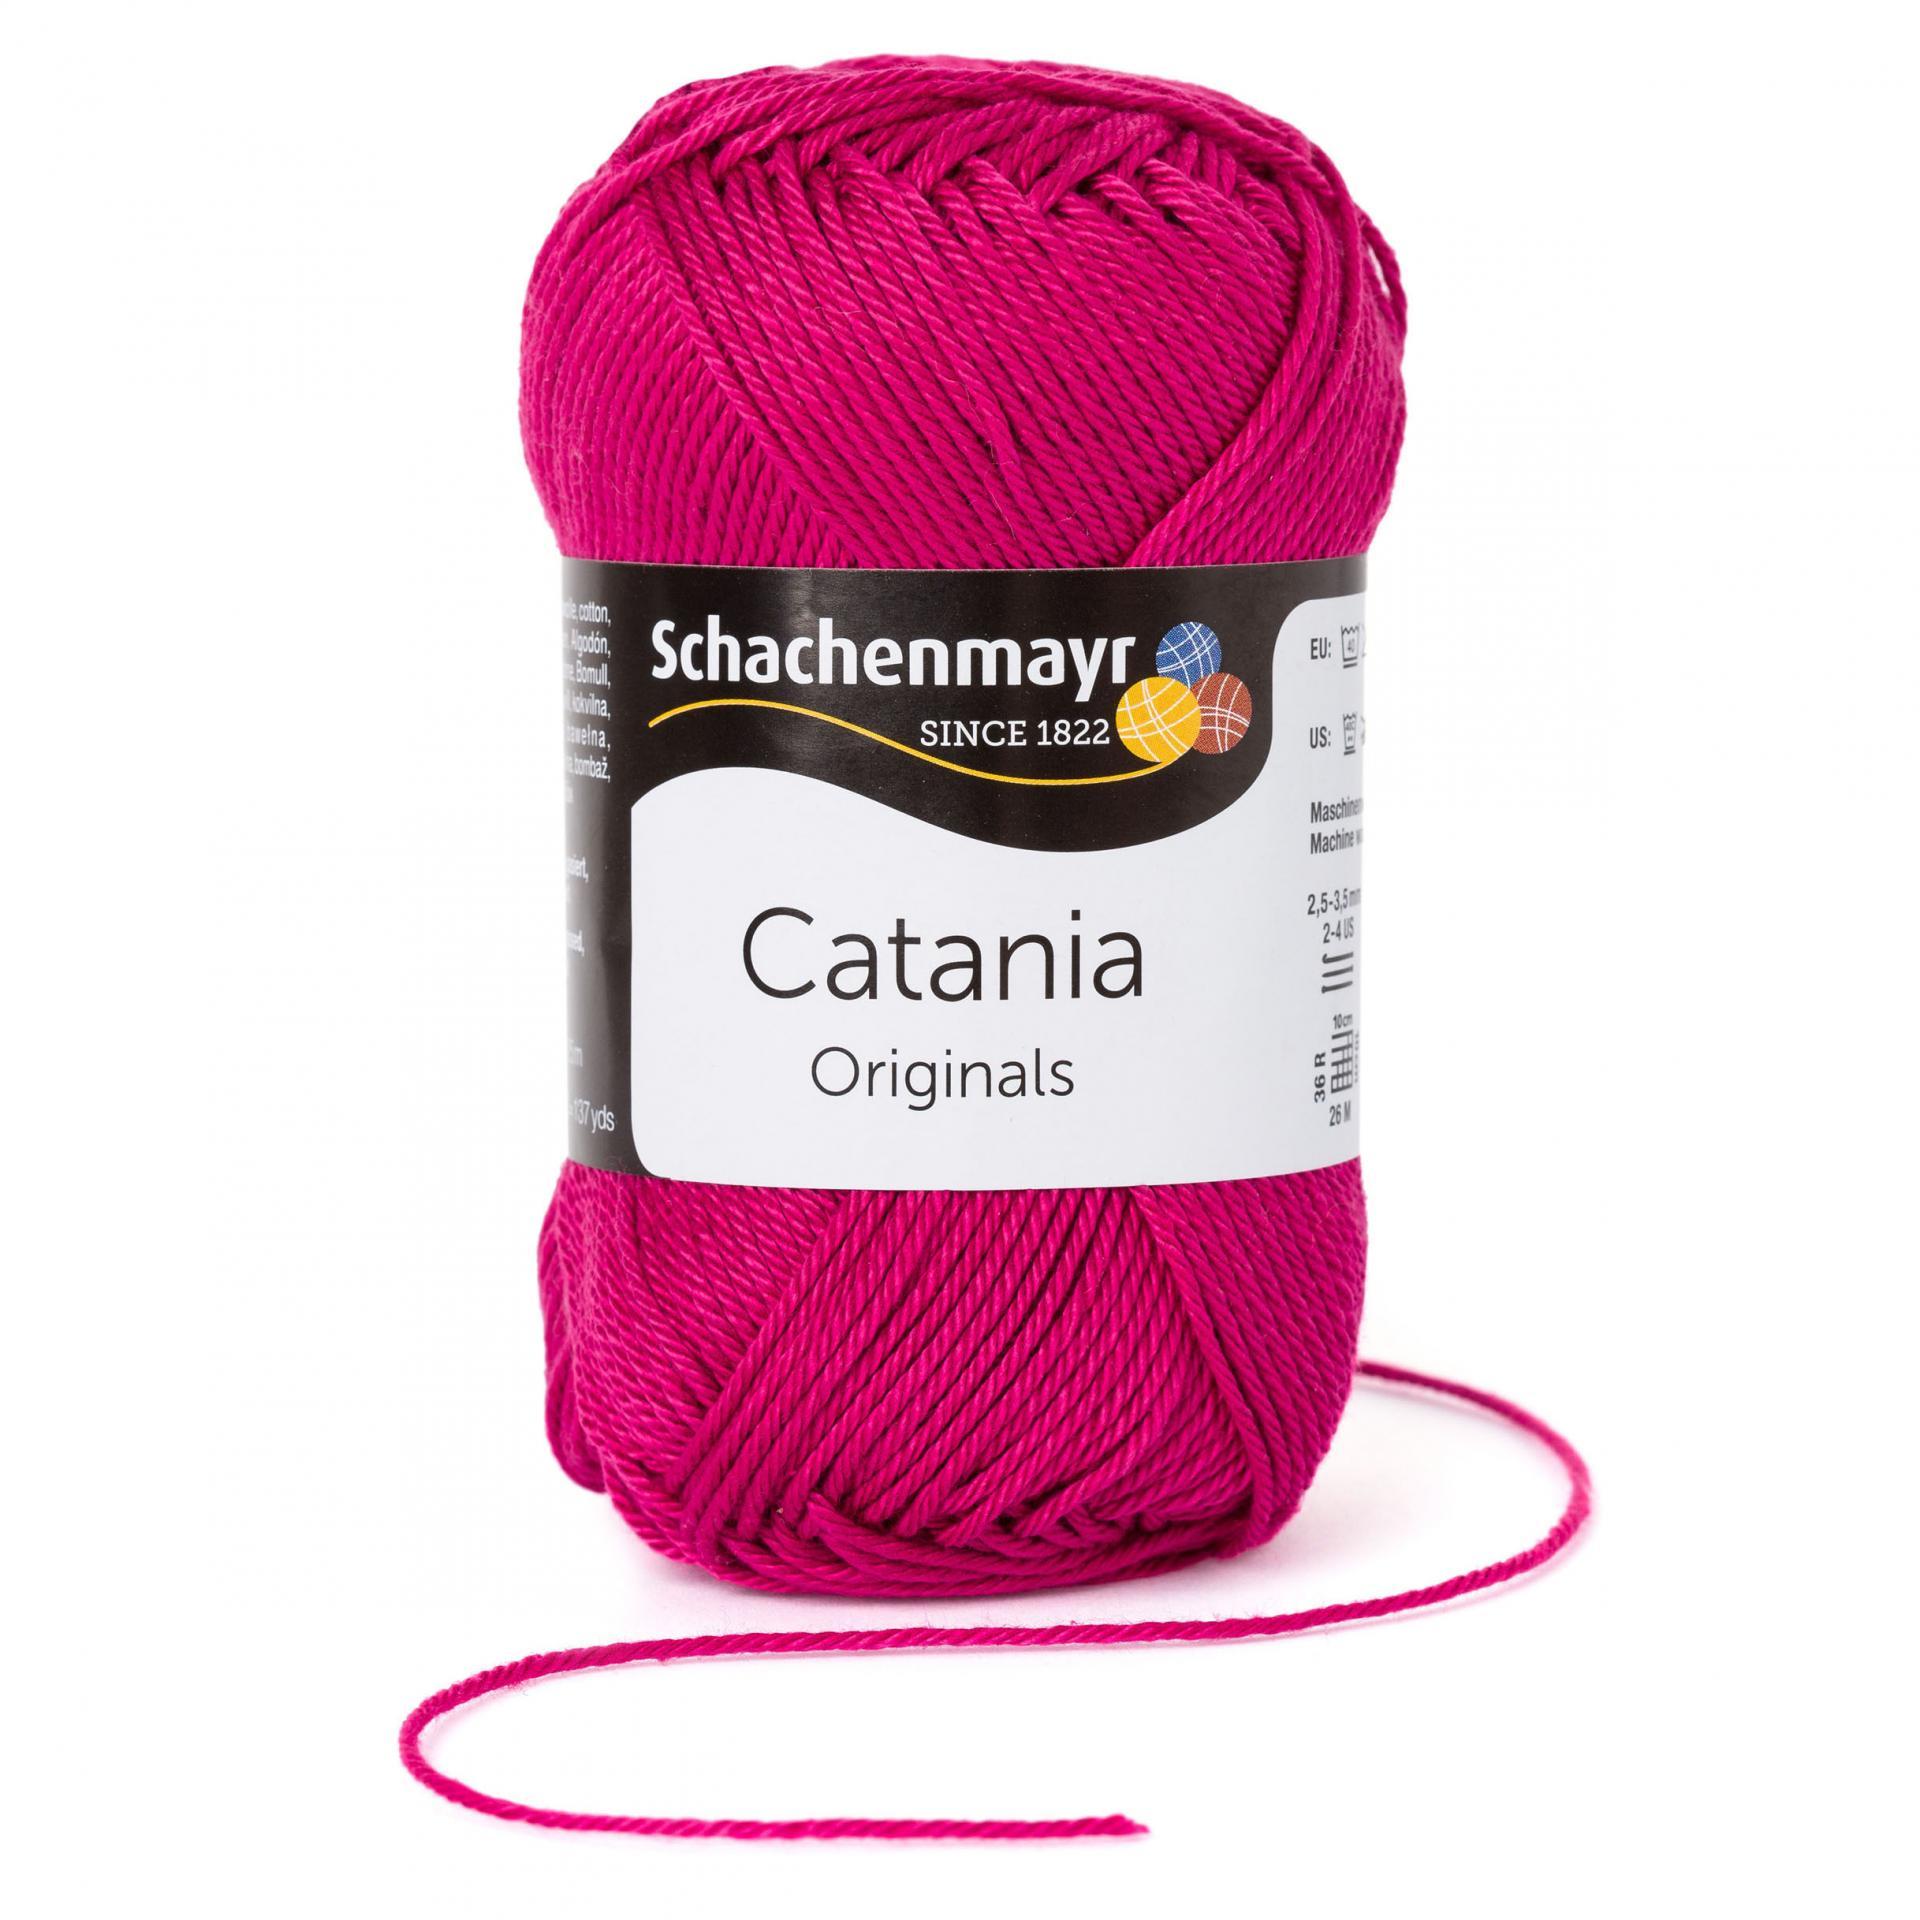 Catania granate 413